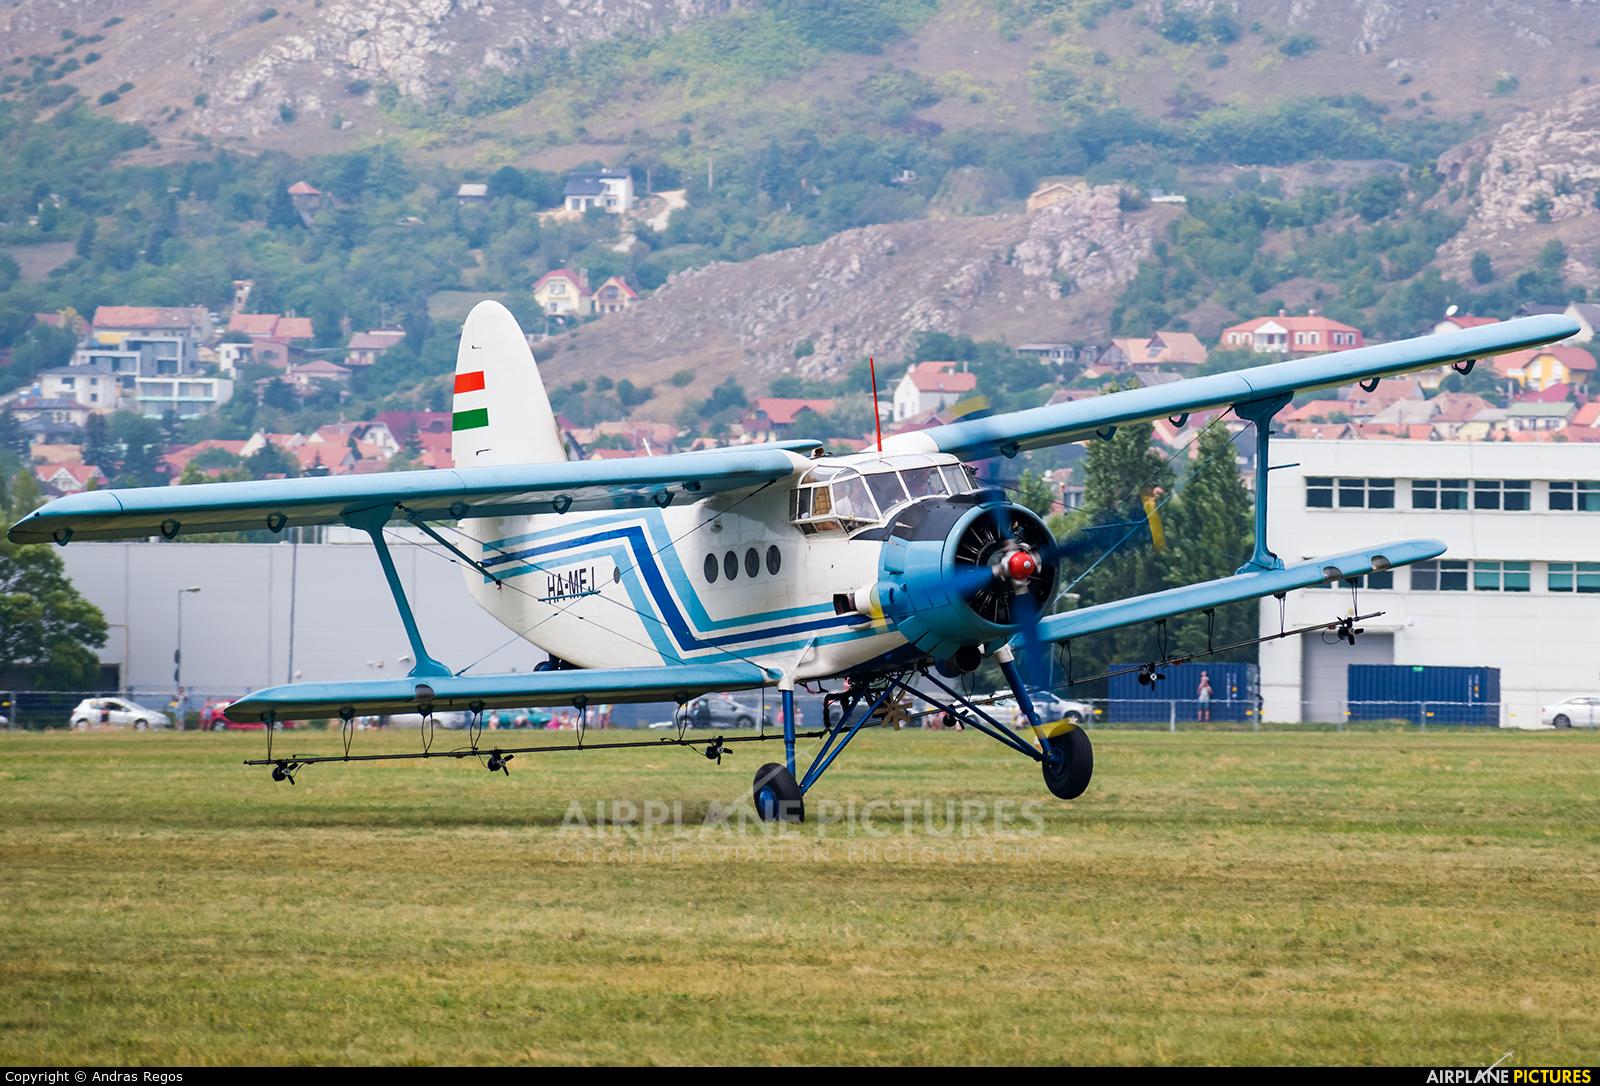 Private HA-MEJ aircraft at Budaors